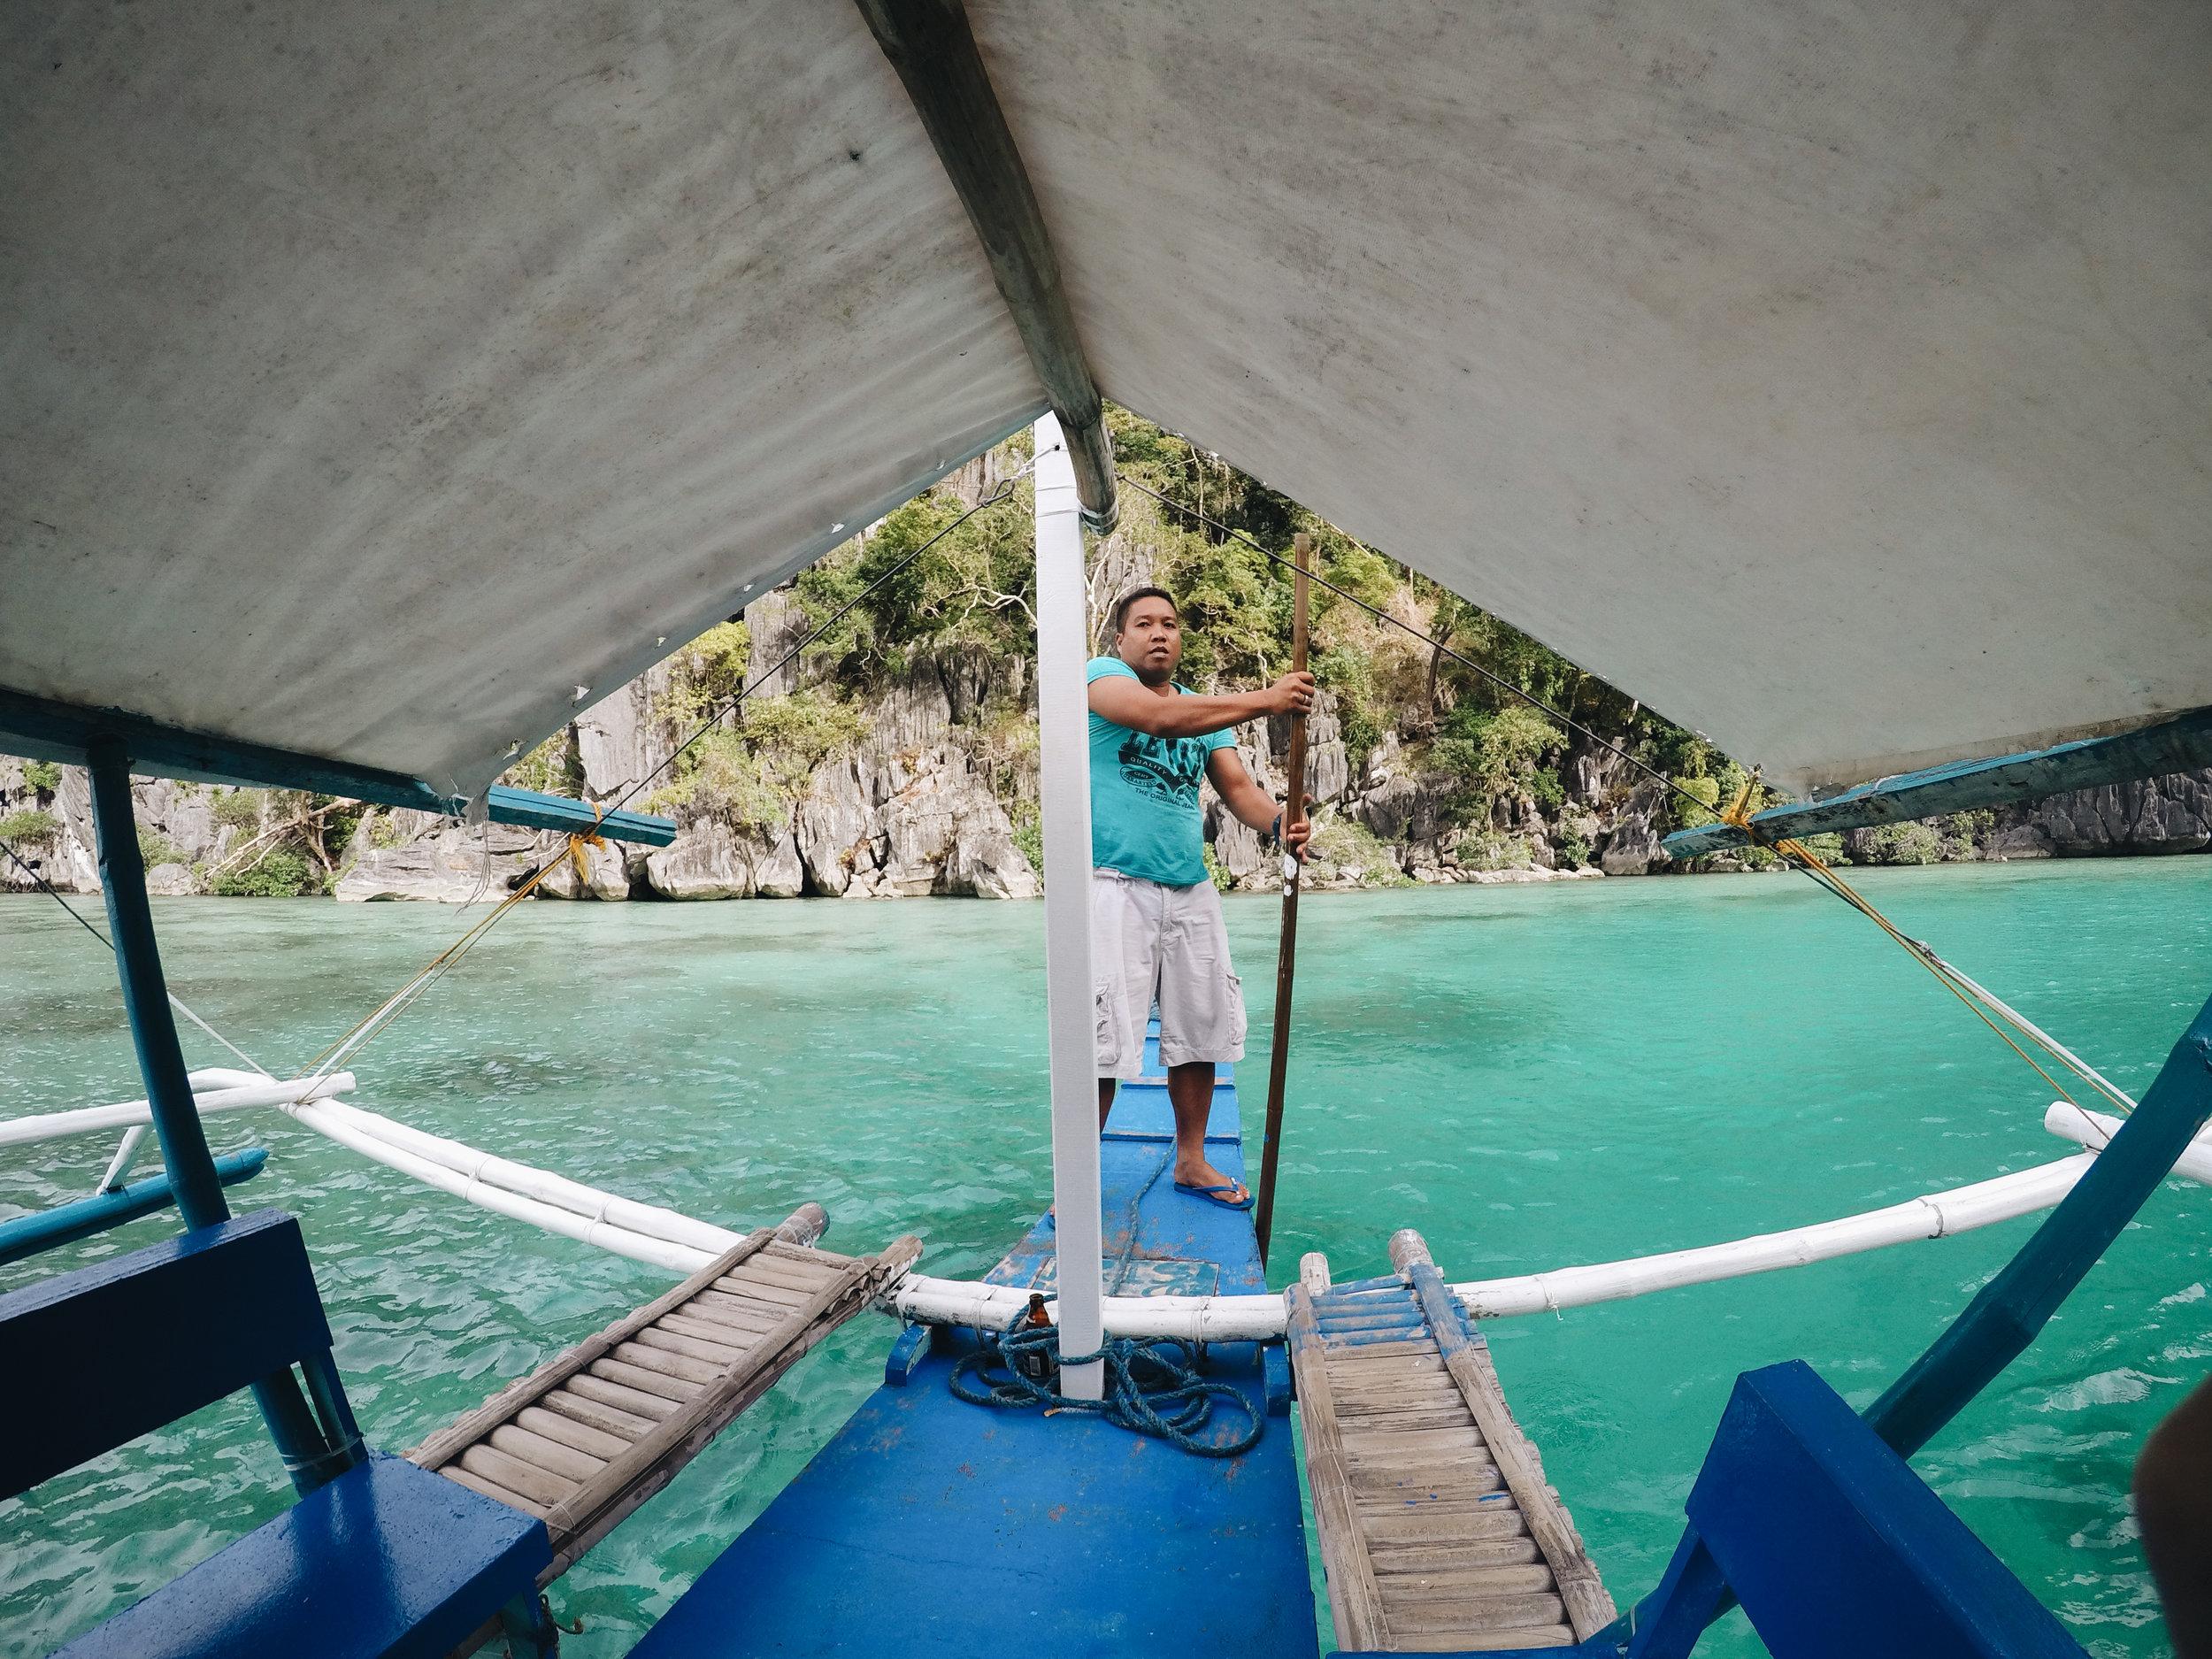 coron-philippines-big-dream-travel-palawan.jpg